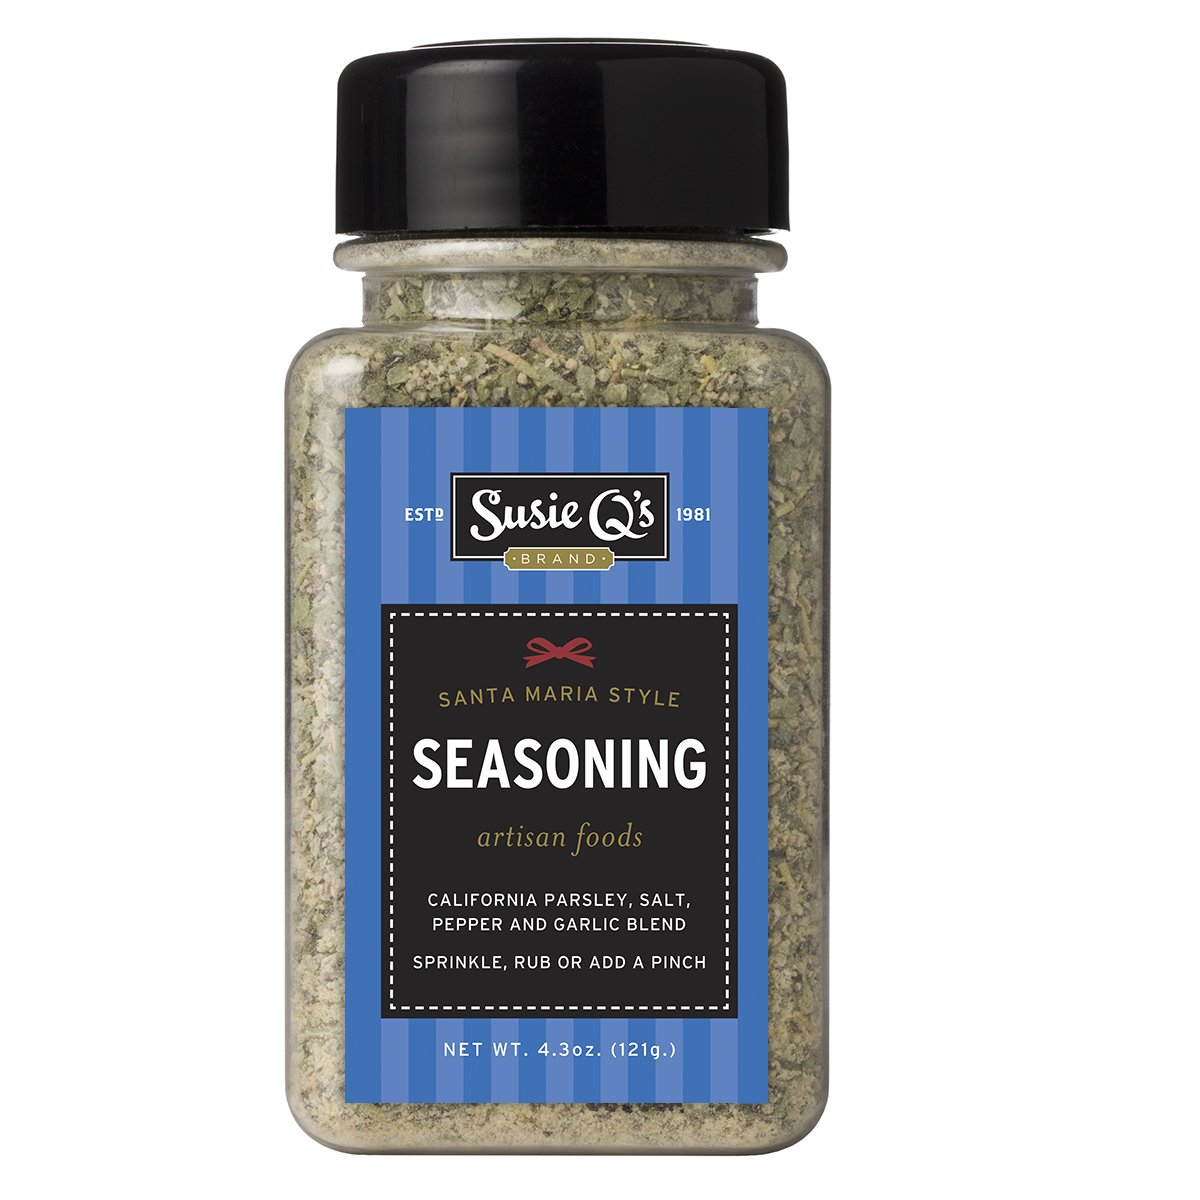 Scott S Food Products Santa Maria Seasoning